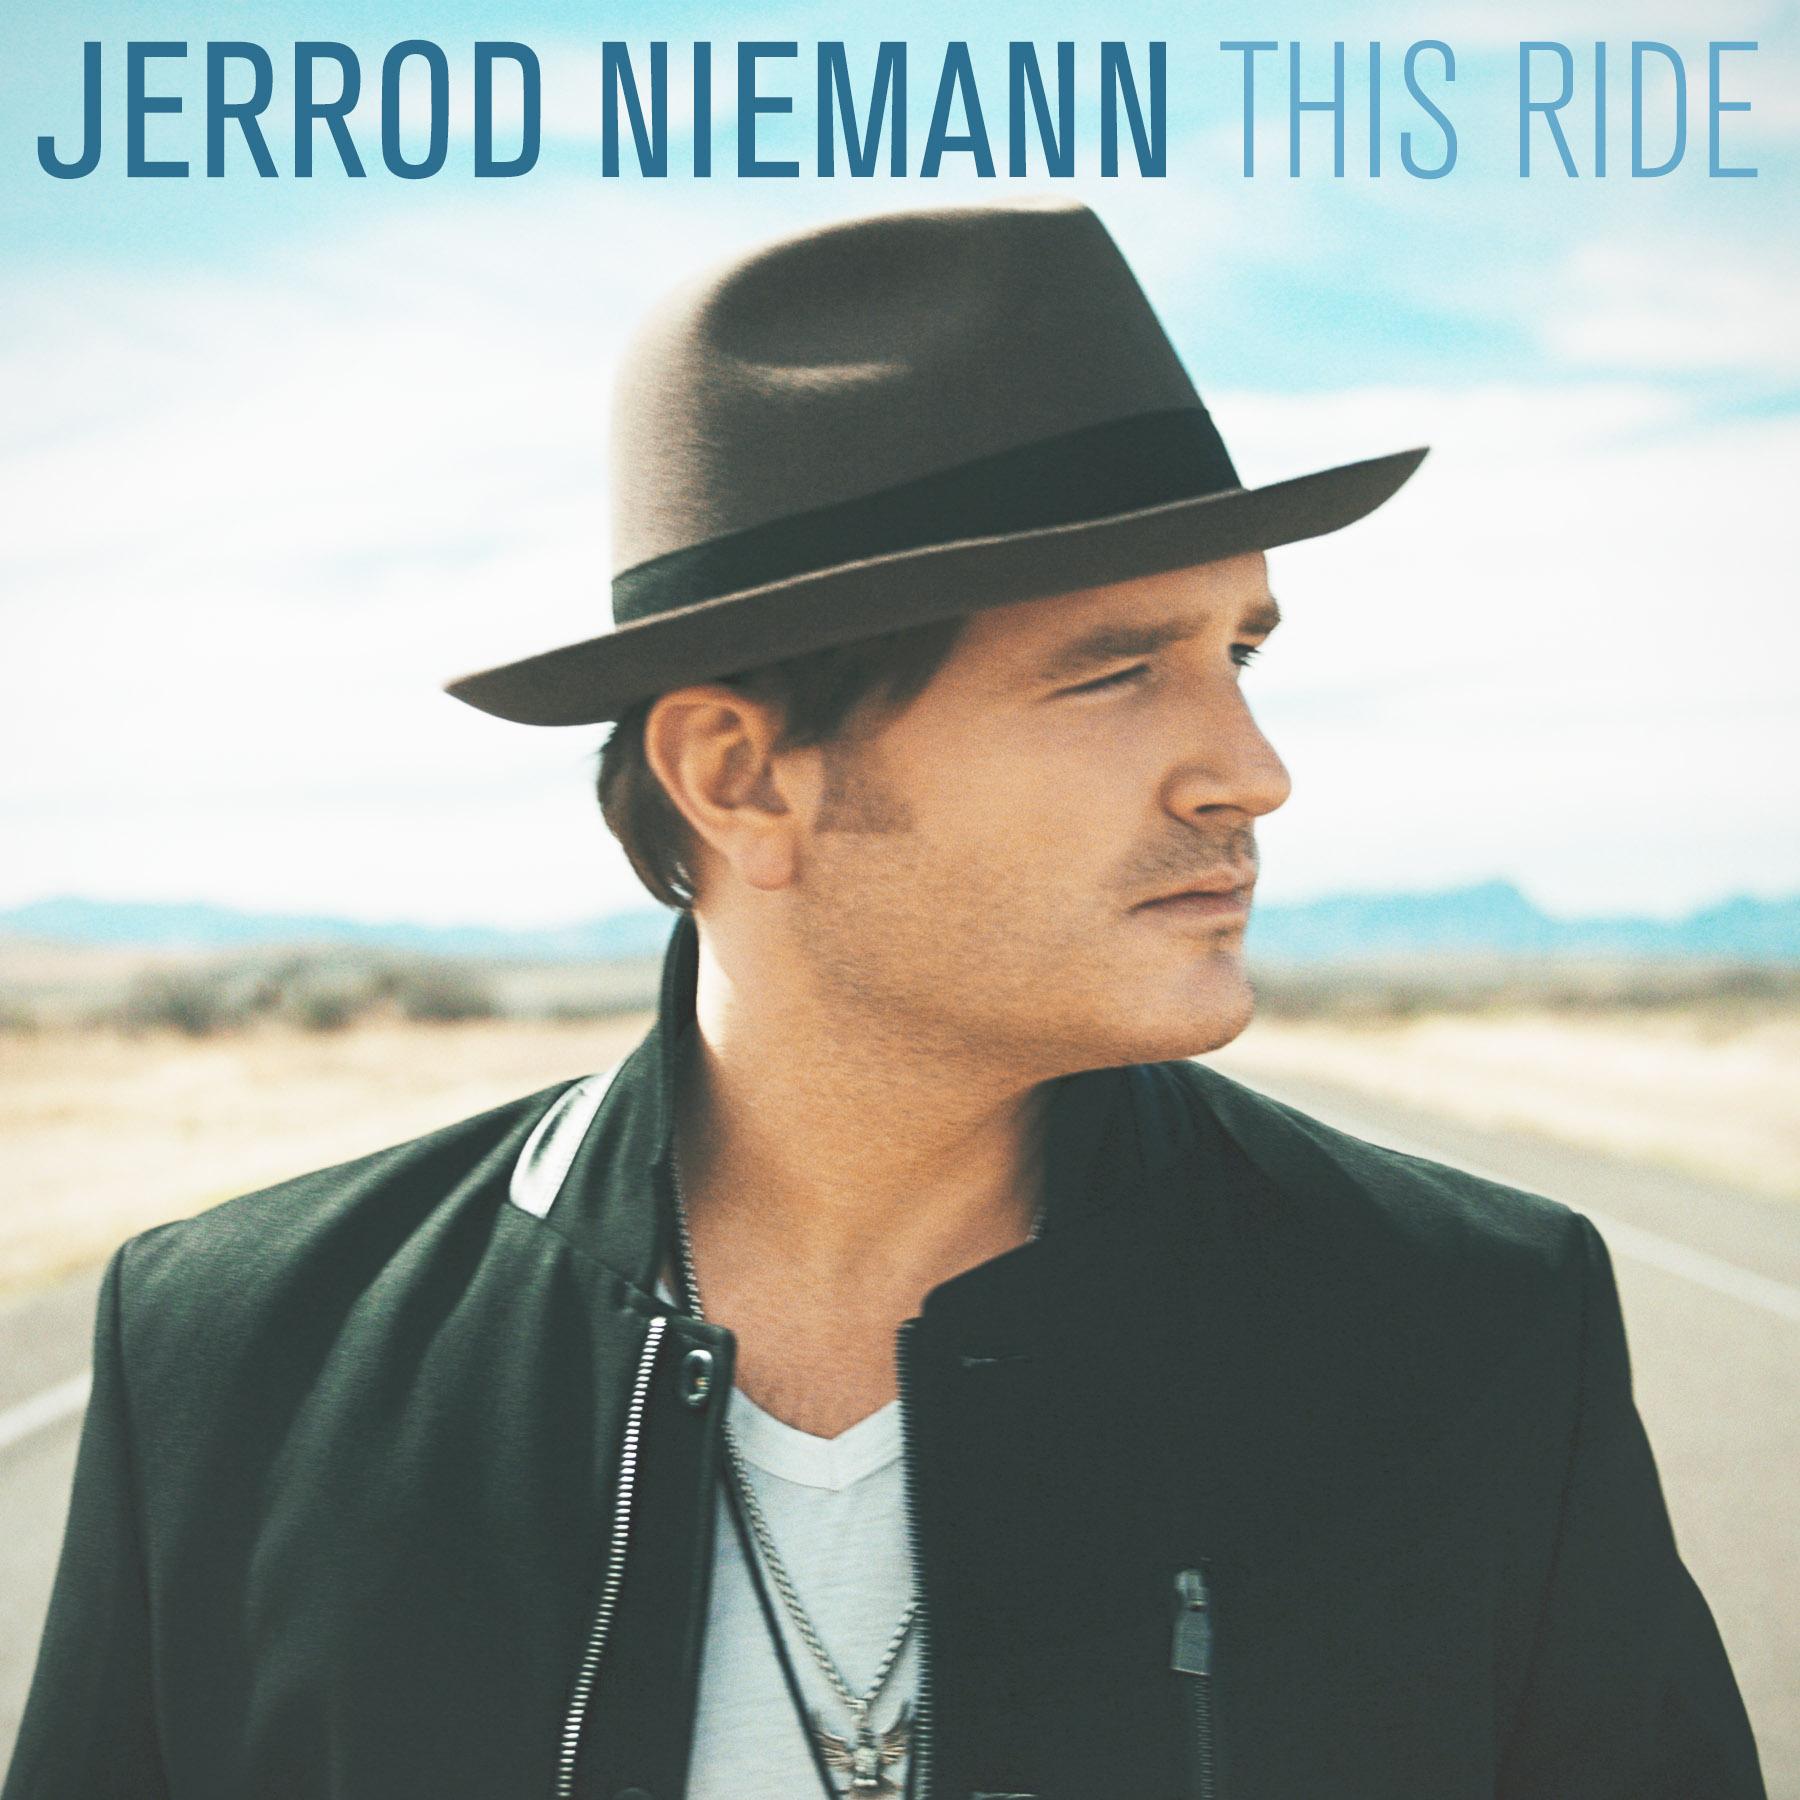 Album Review: Jerrod Niemann's 'This Ride'